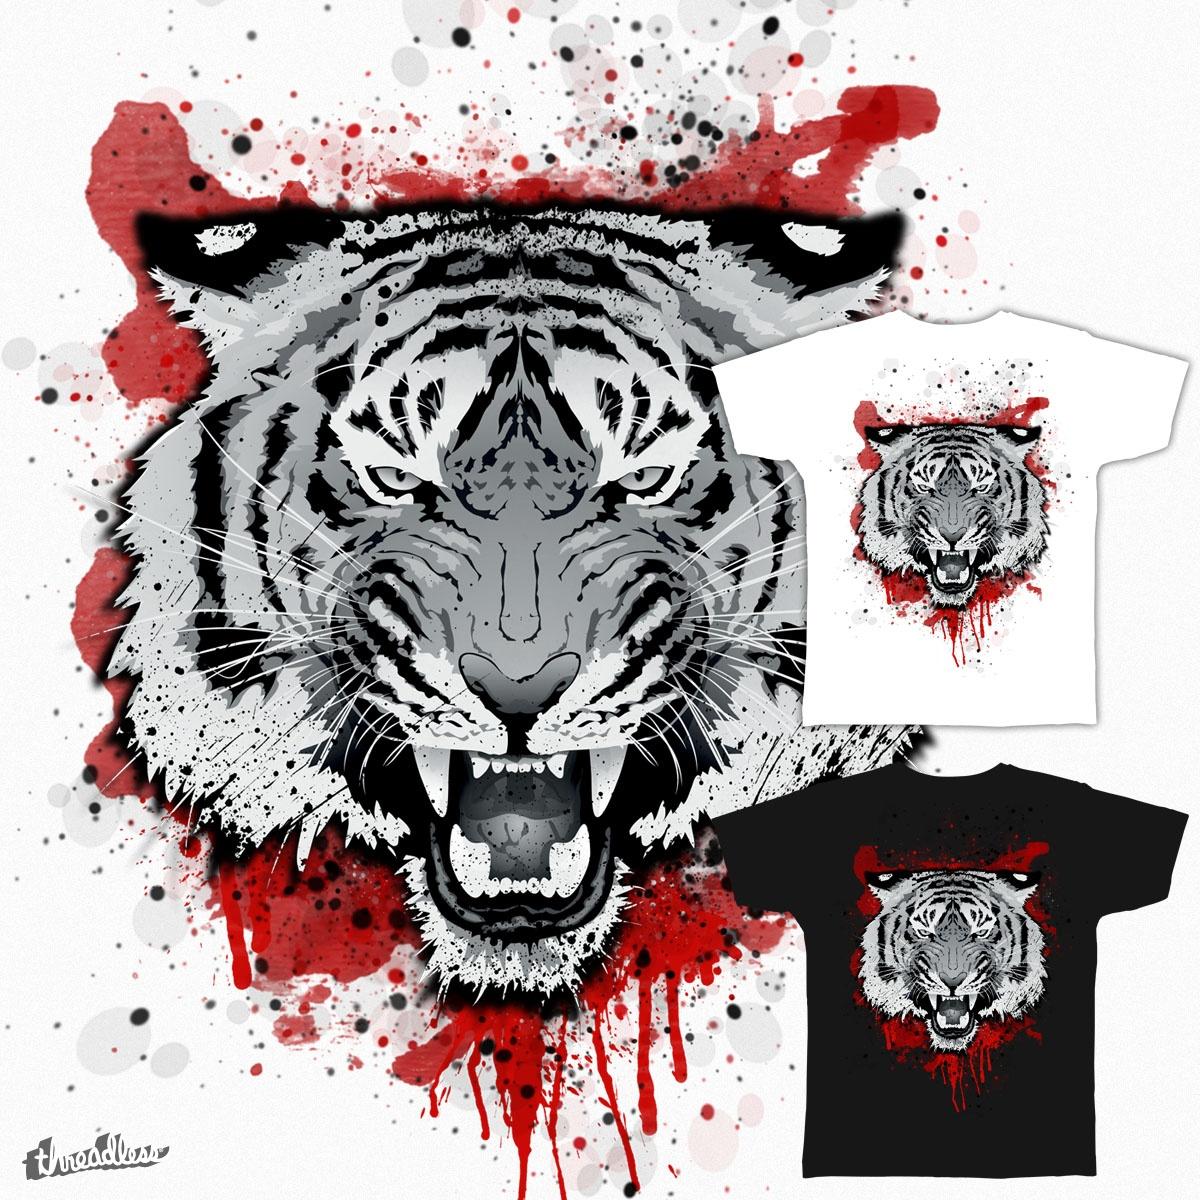 tiger_head_blood by ben35dan on Threadless